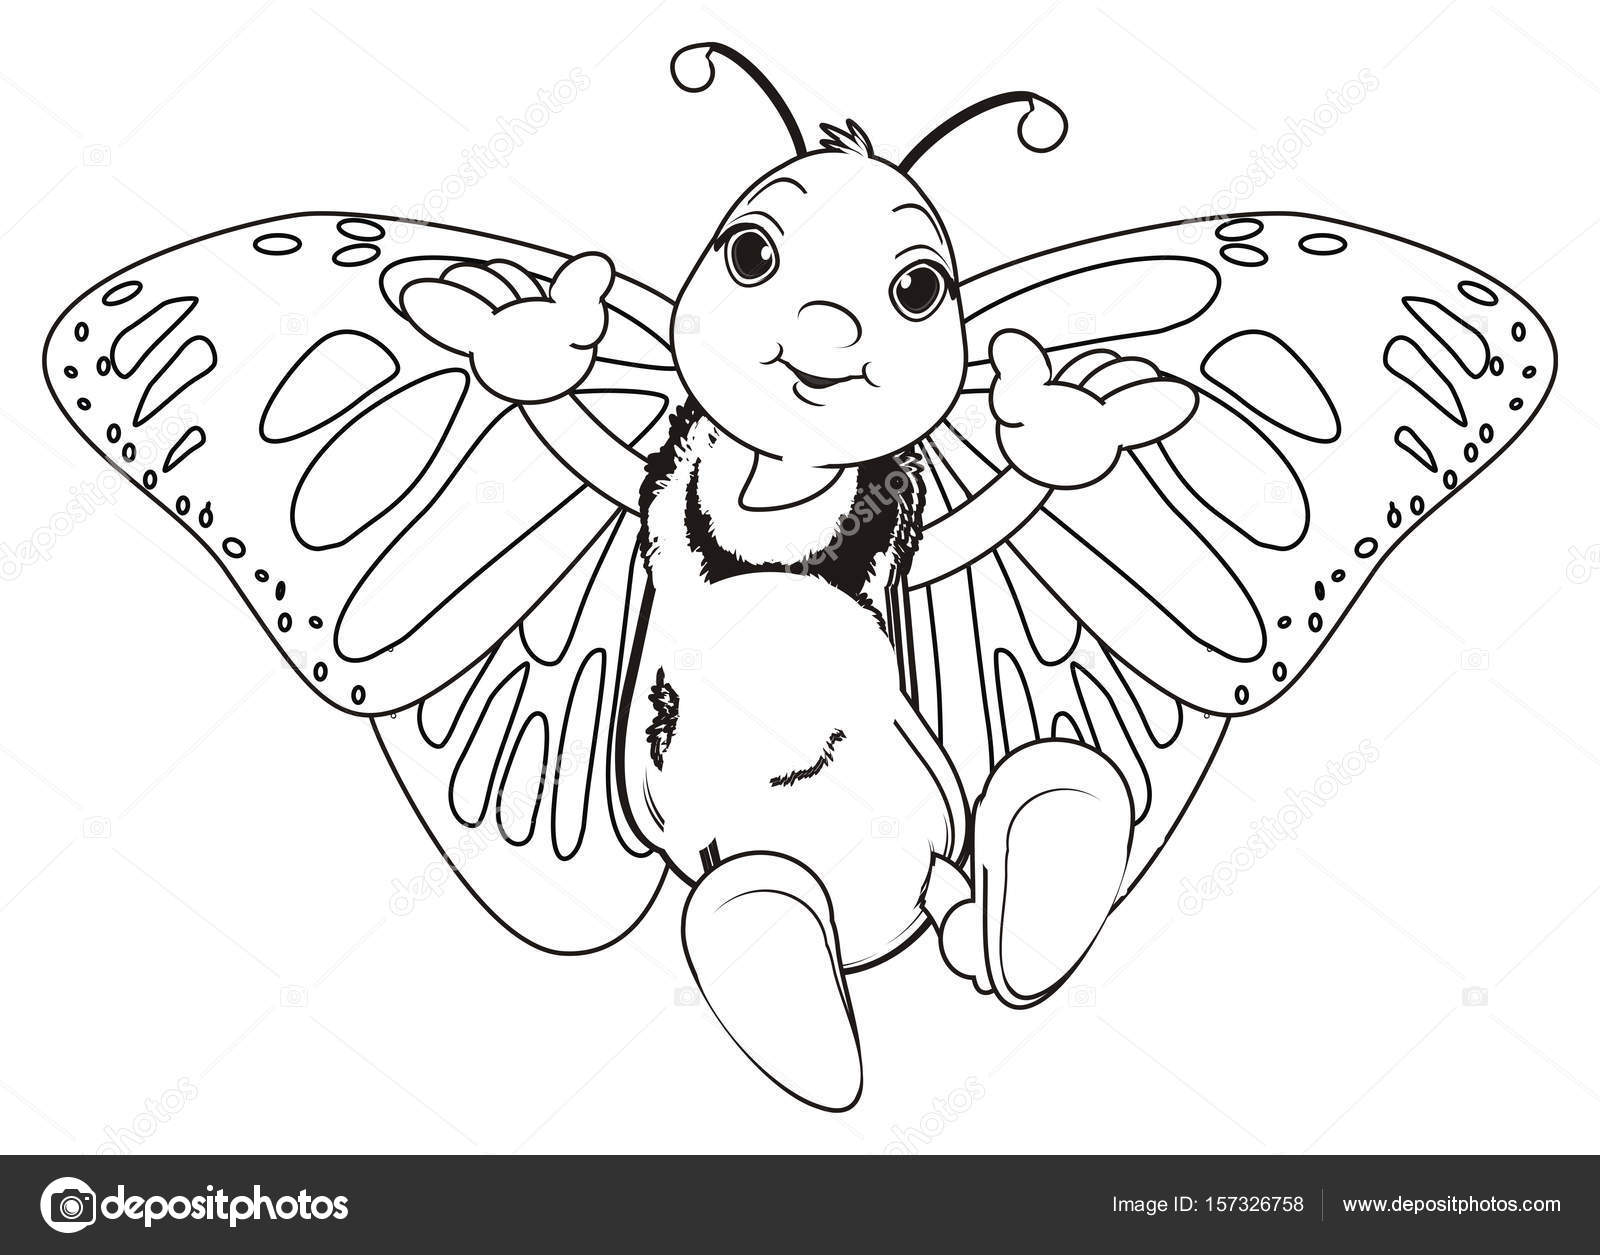 Malvorlagen Schmetterling lächelnd — Stockfoto © tatty77tatty #157326758